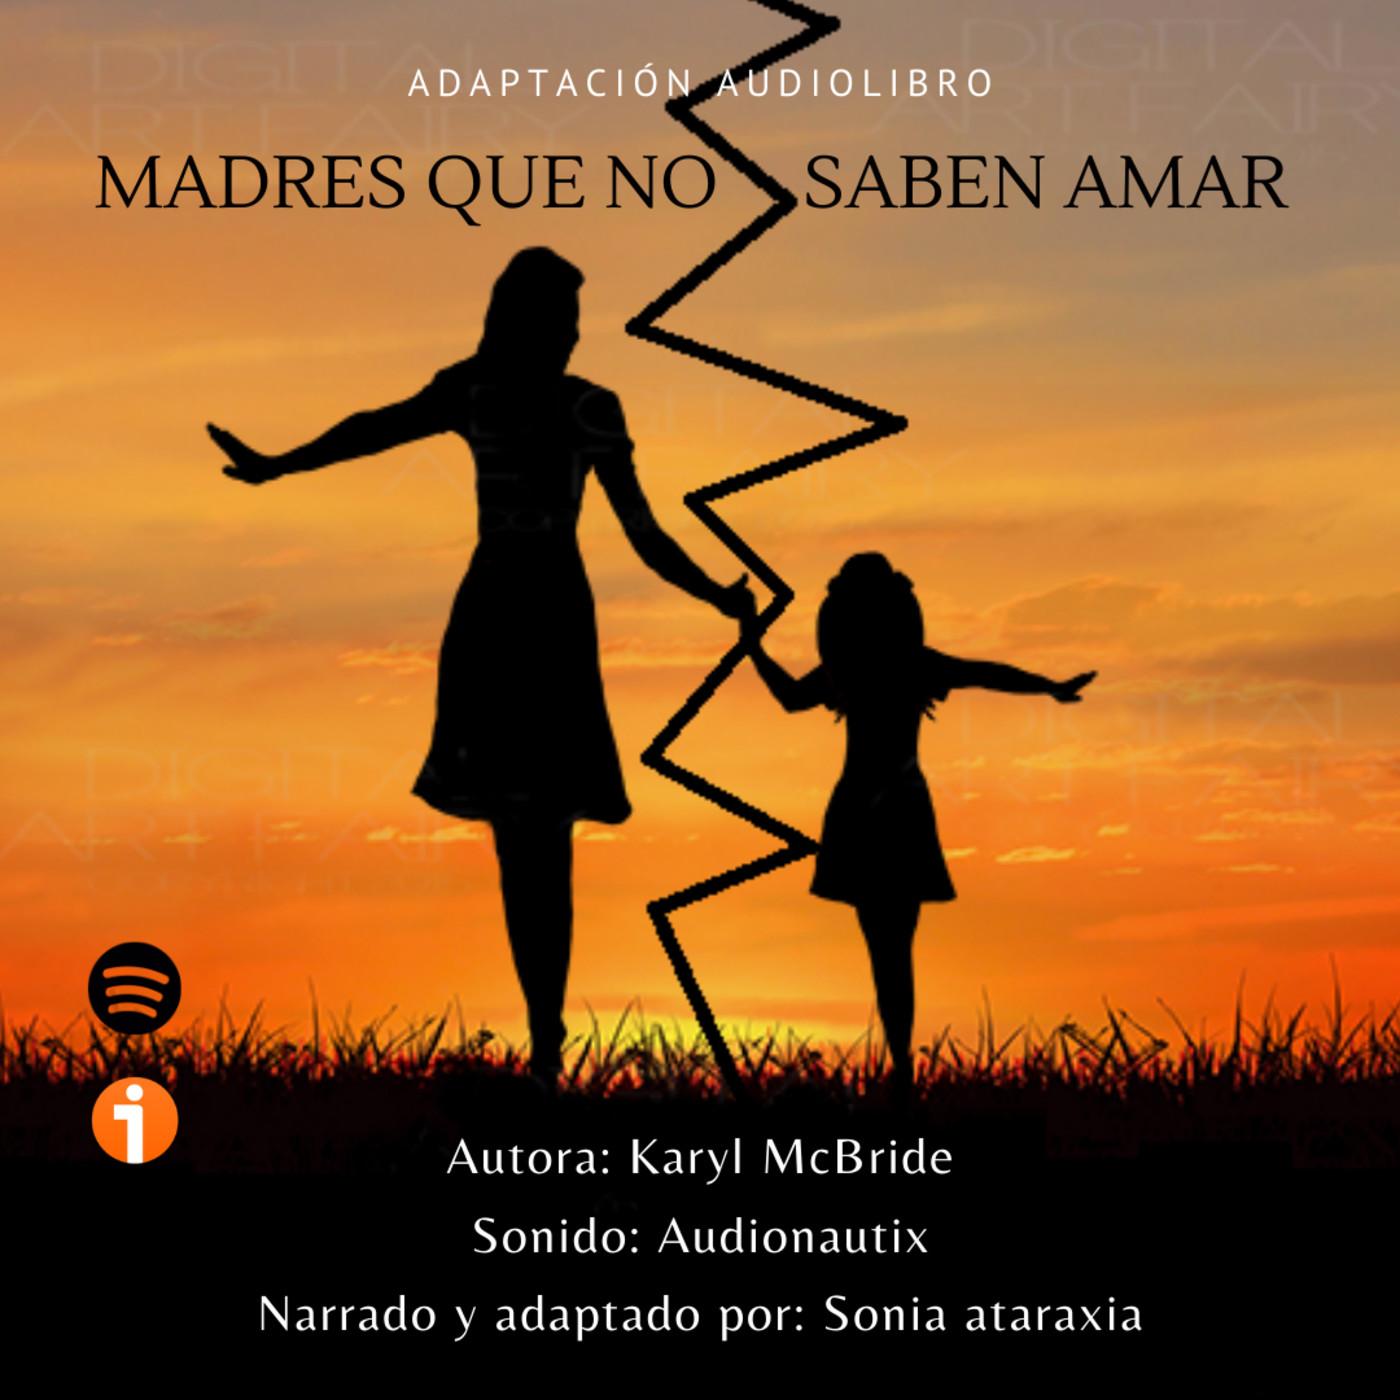 01 Hija De Madre Narcicista Mqnsa K M En Sonia Ataraxia En Mp3 07 06 A Las 03 34 01 01 05 16 51816016 Ivoox